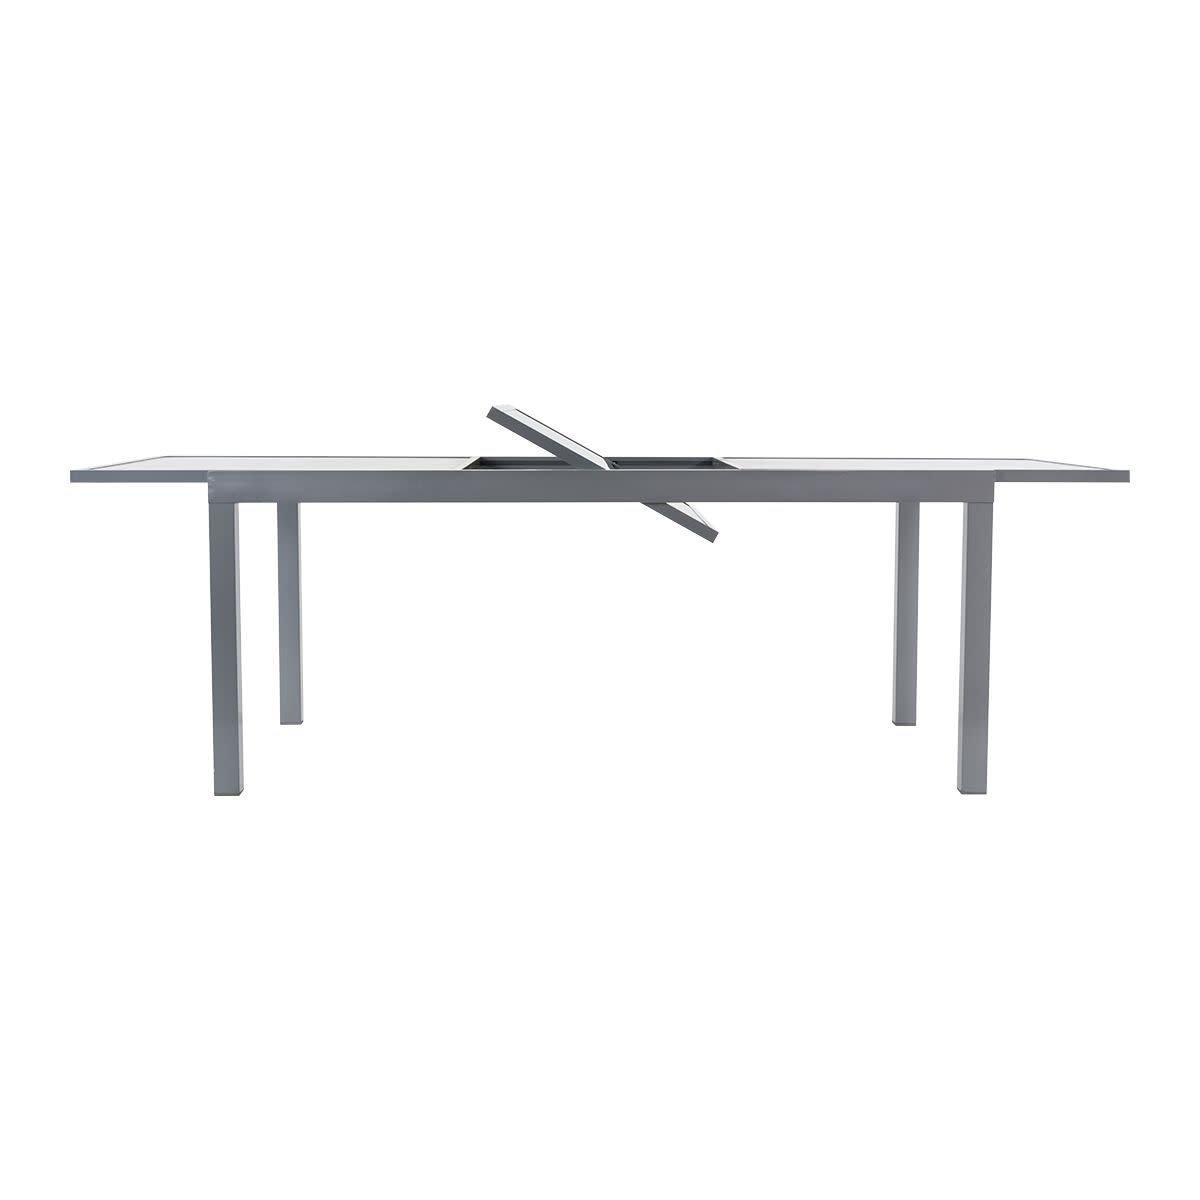 Amazon De Gartentisch Futura Ausziehtisch Aluminium Glas Grau